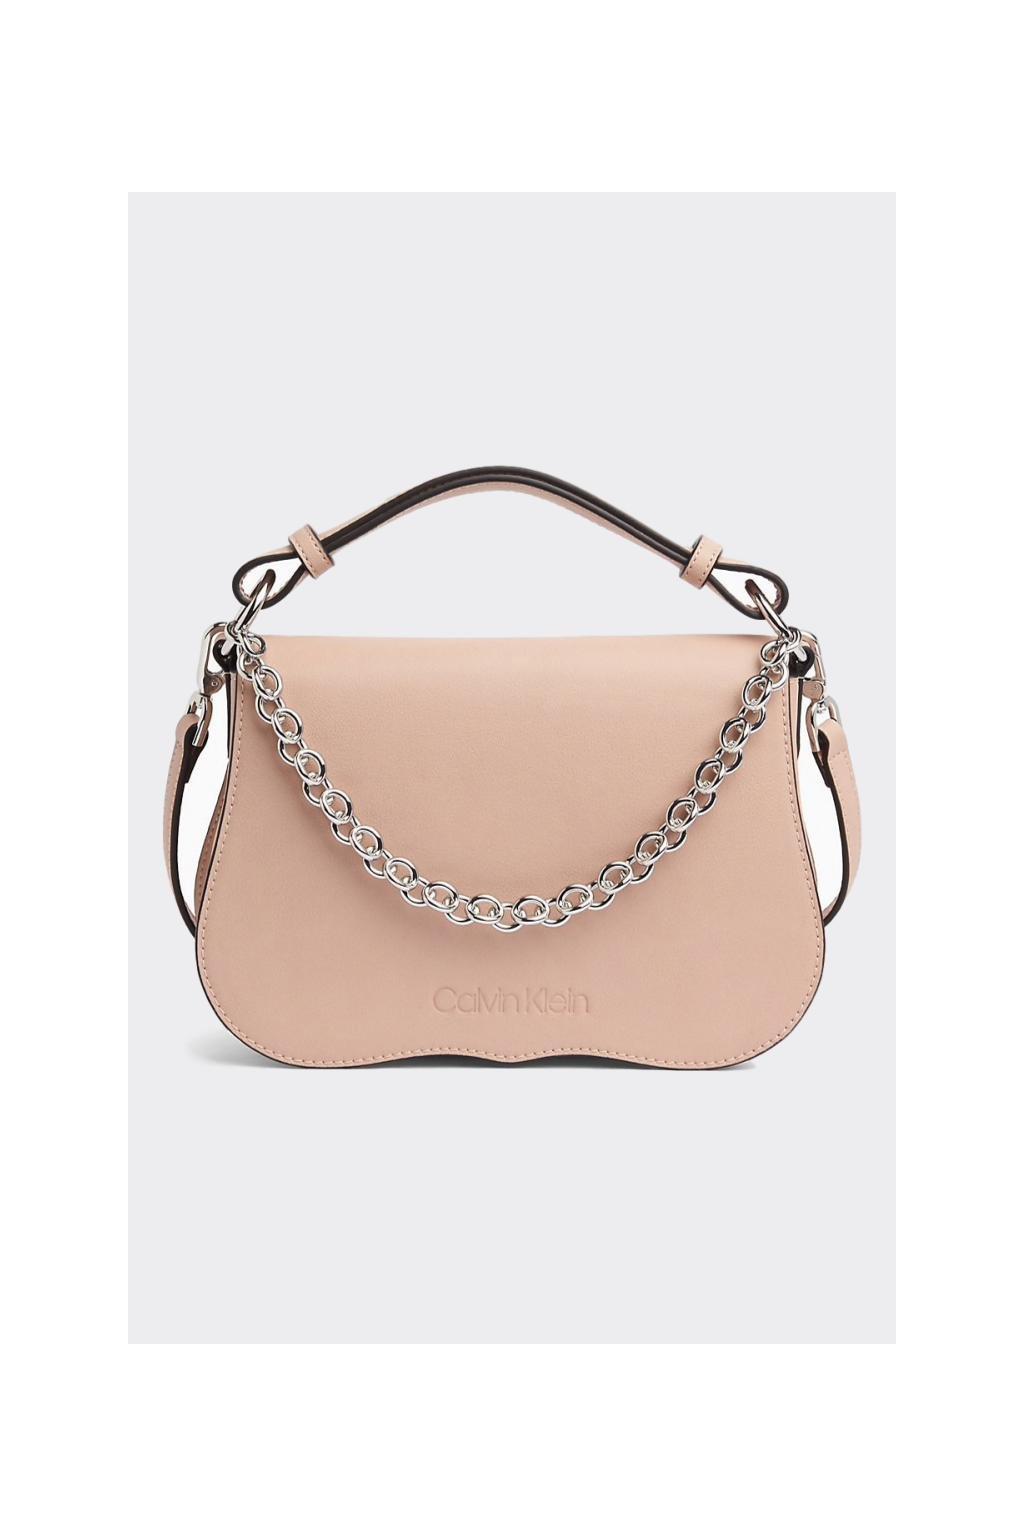 Calvin Klein americana crossbody kabelka - světle růžová